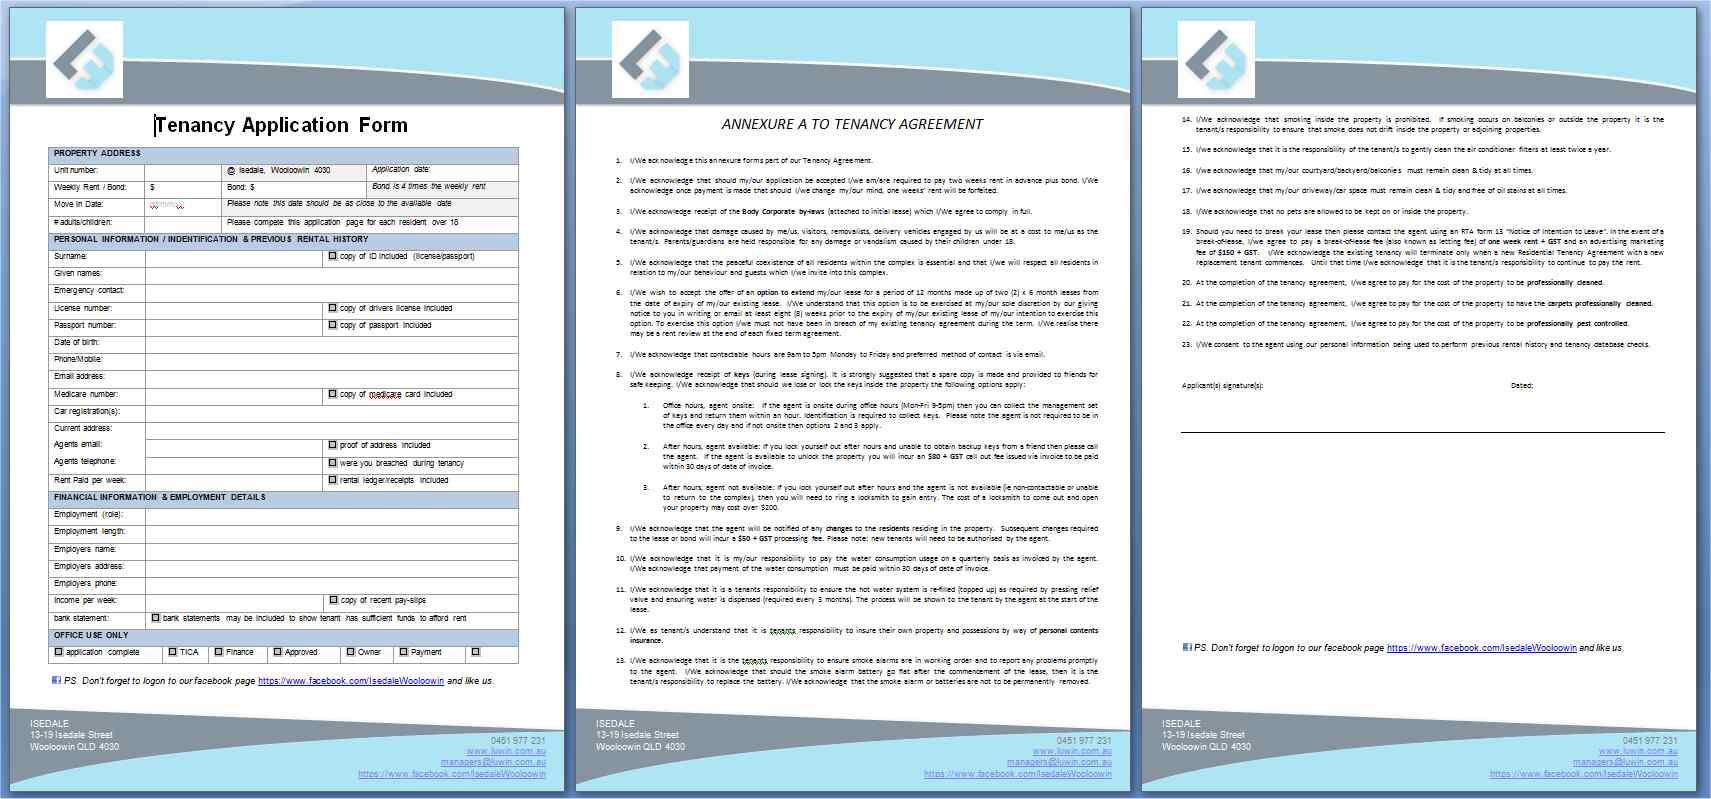 Tenancy Application Form